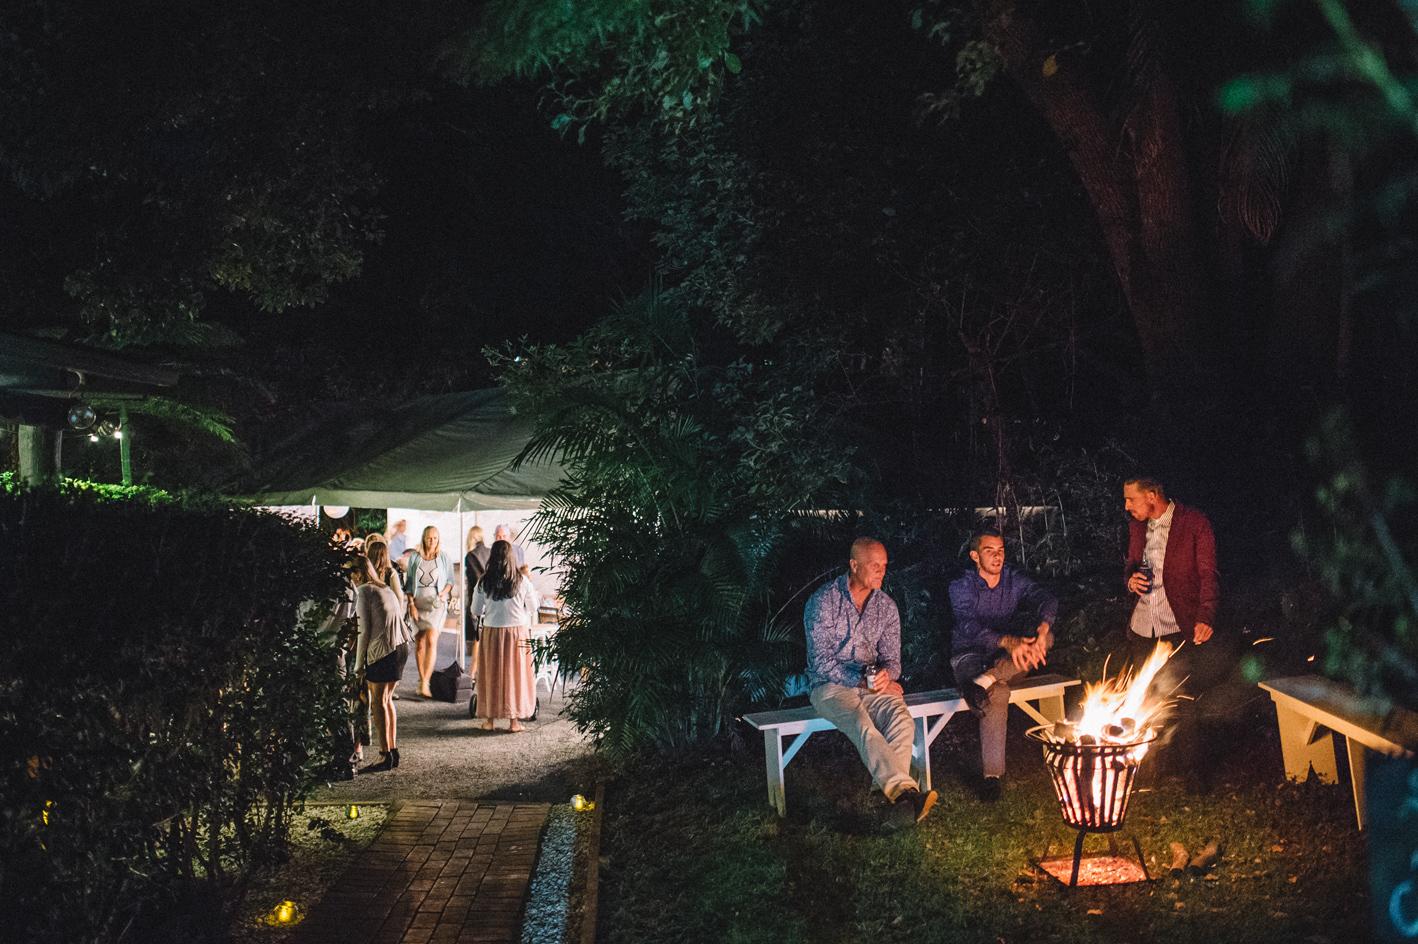 082-michelle-reagan-mount-tamborine-wedding-sophie-baker-photography